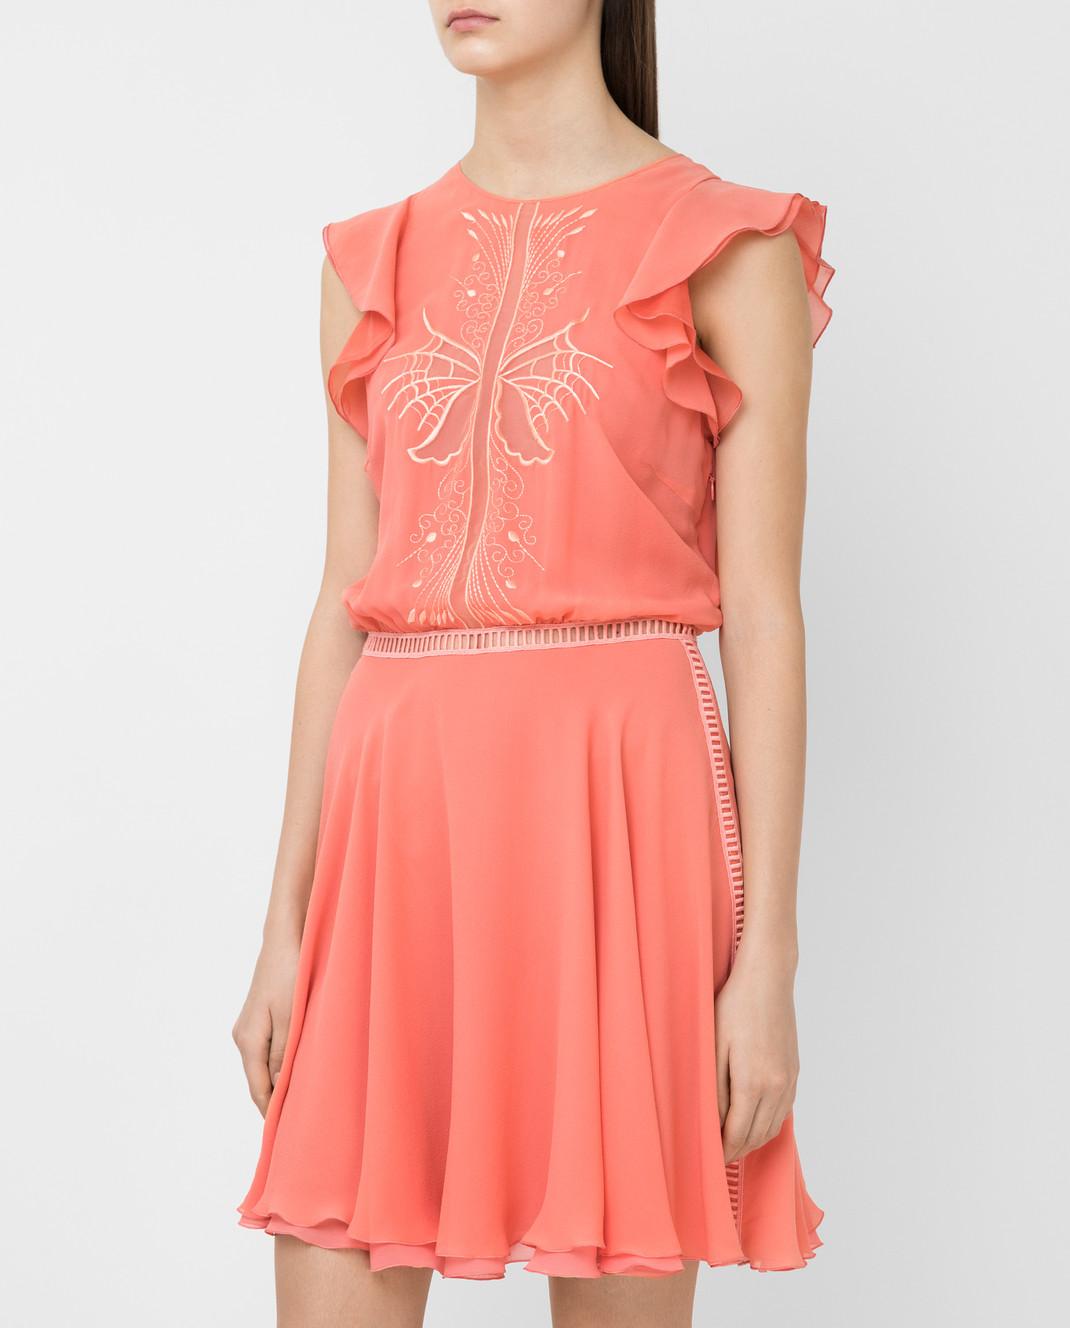 Giamba Коралловое платье из шелка PG5250 изображение 3